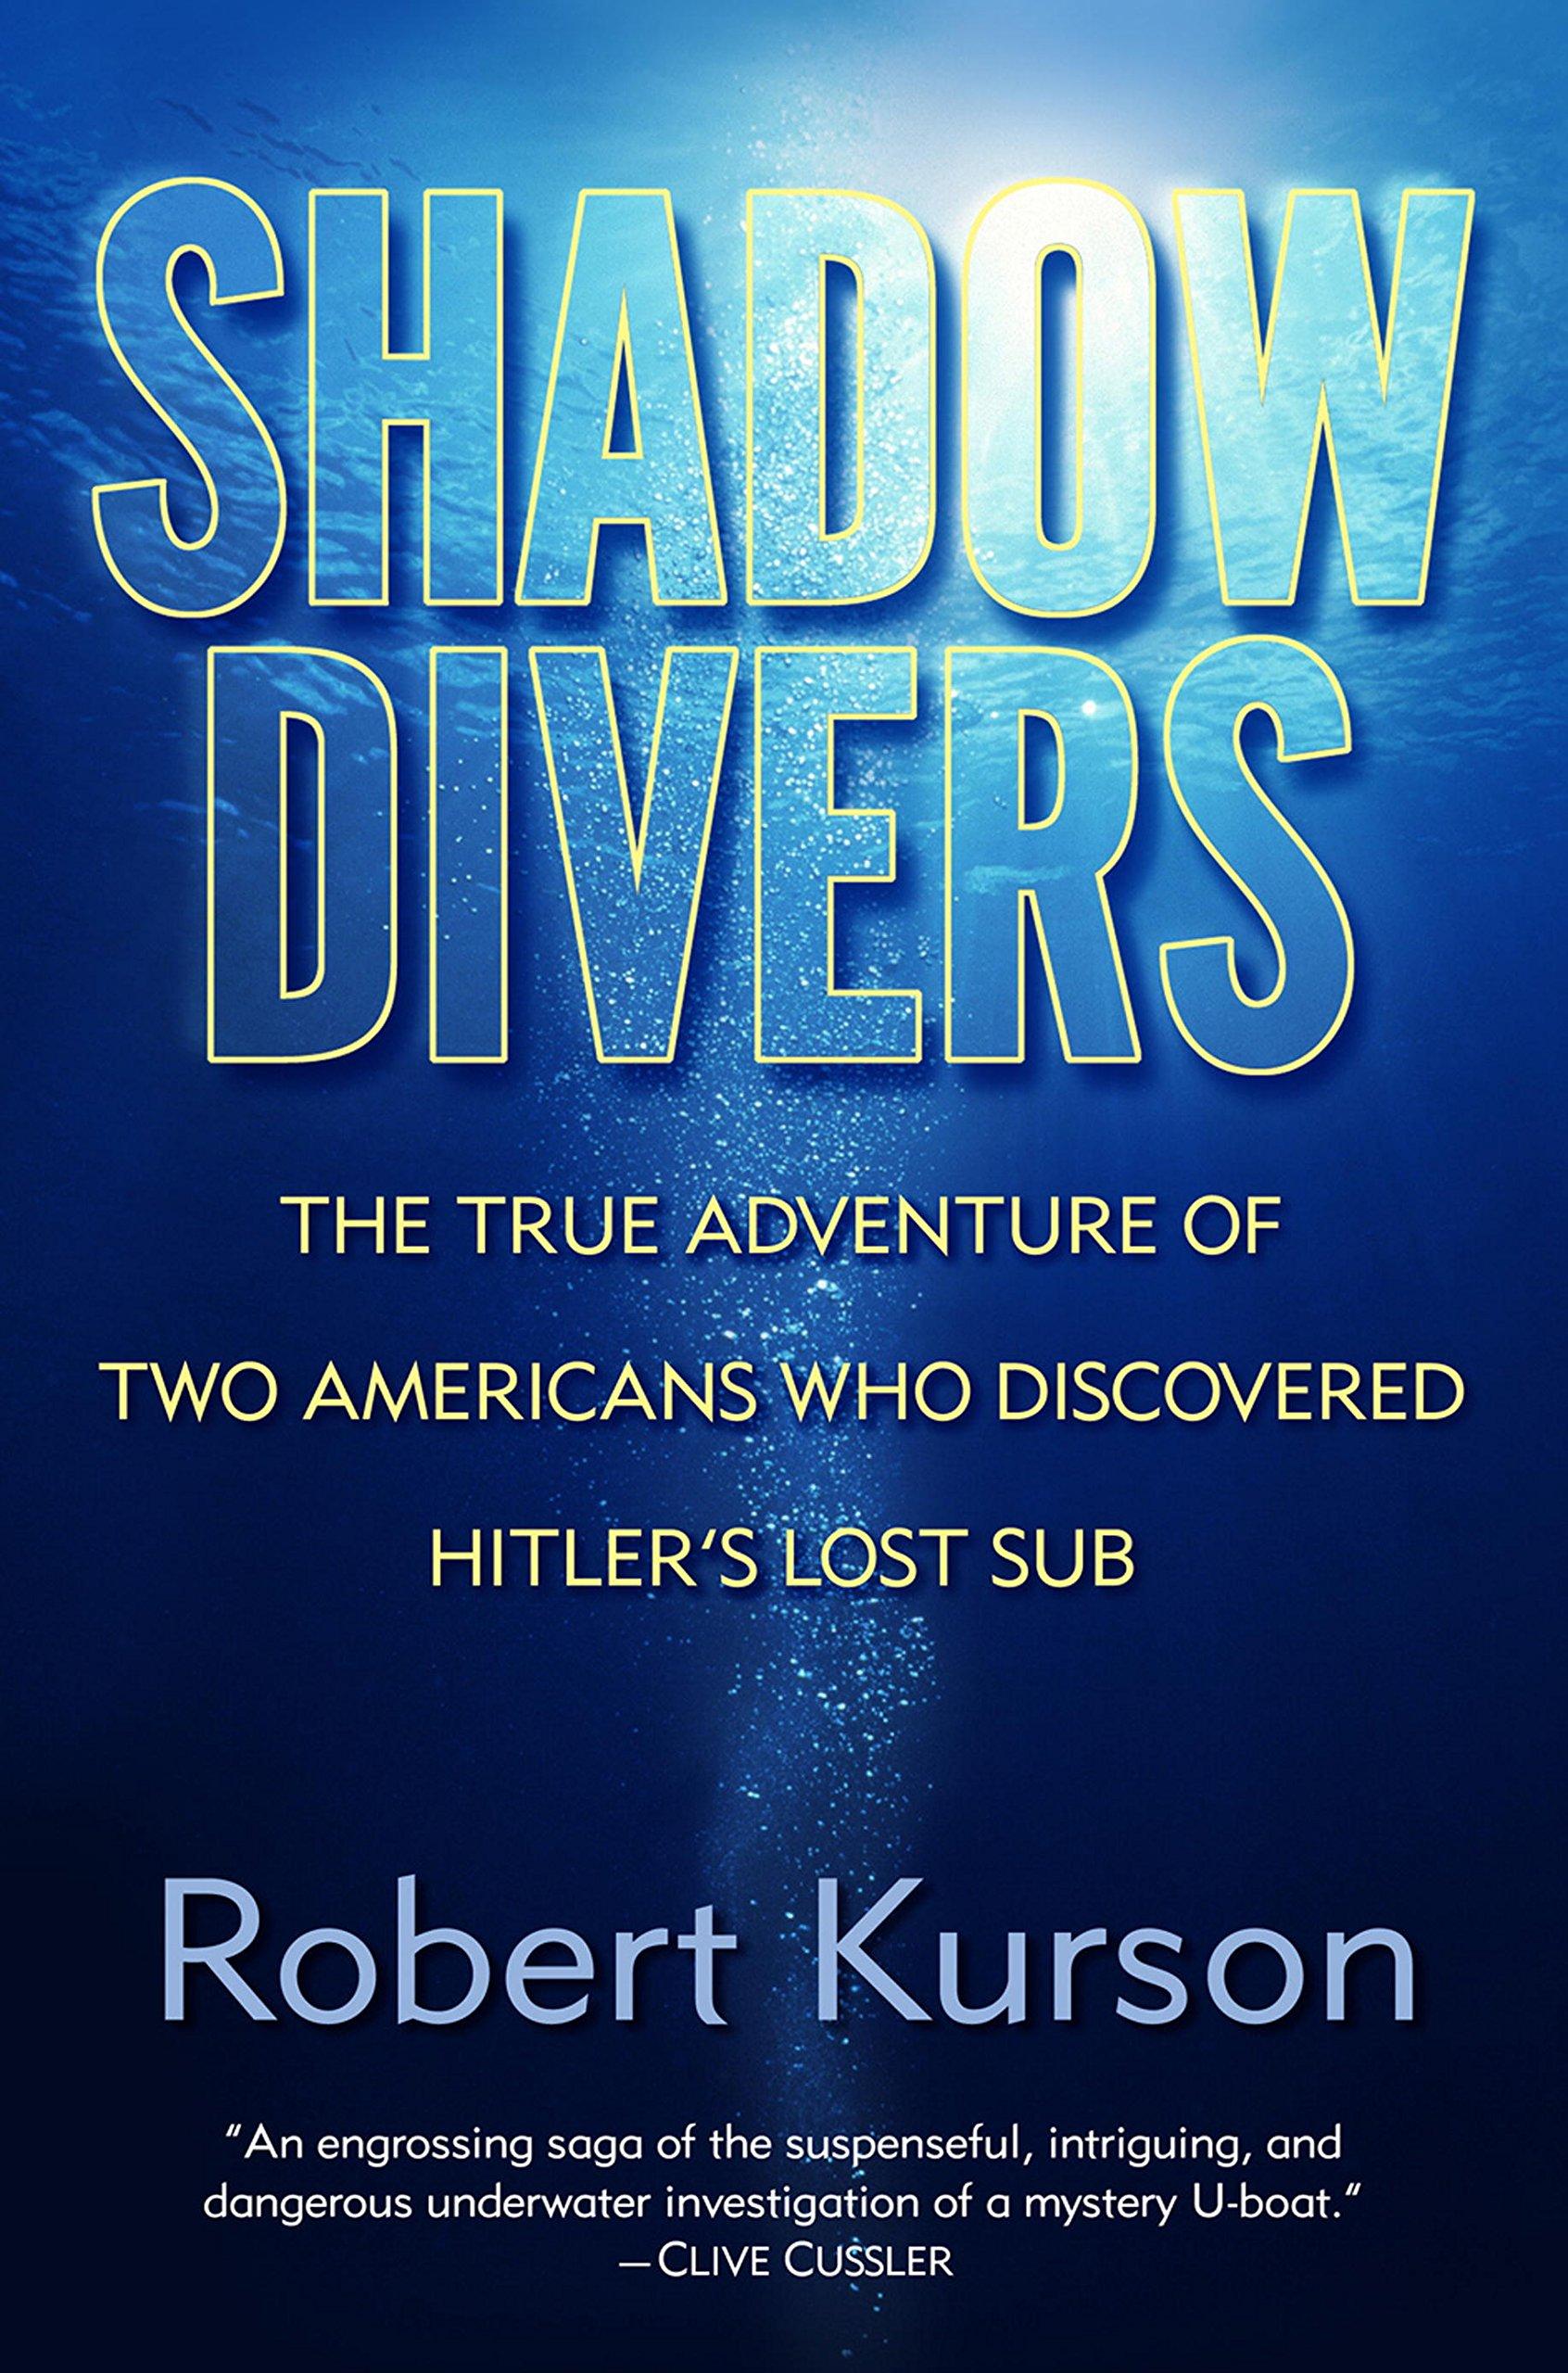 Shadow Divers, by Robert Kurson